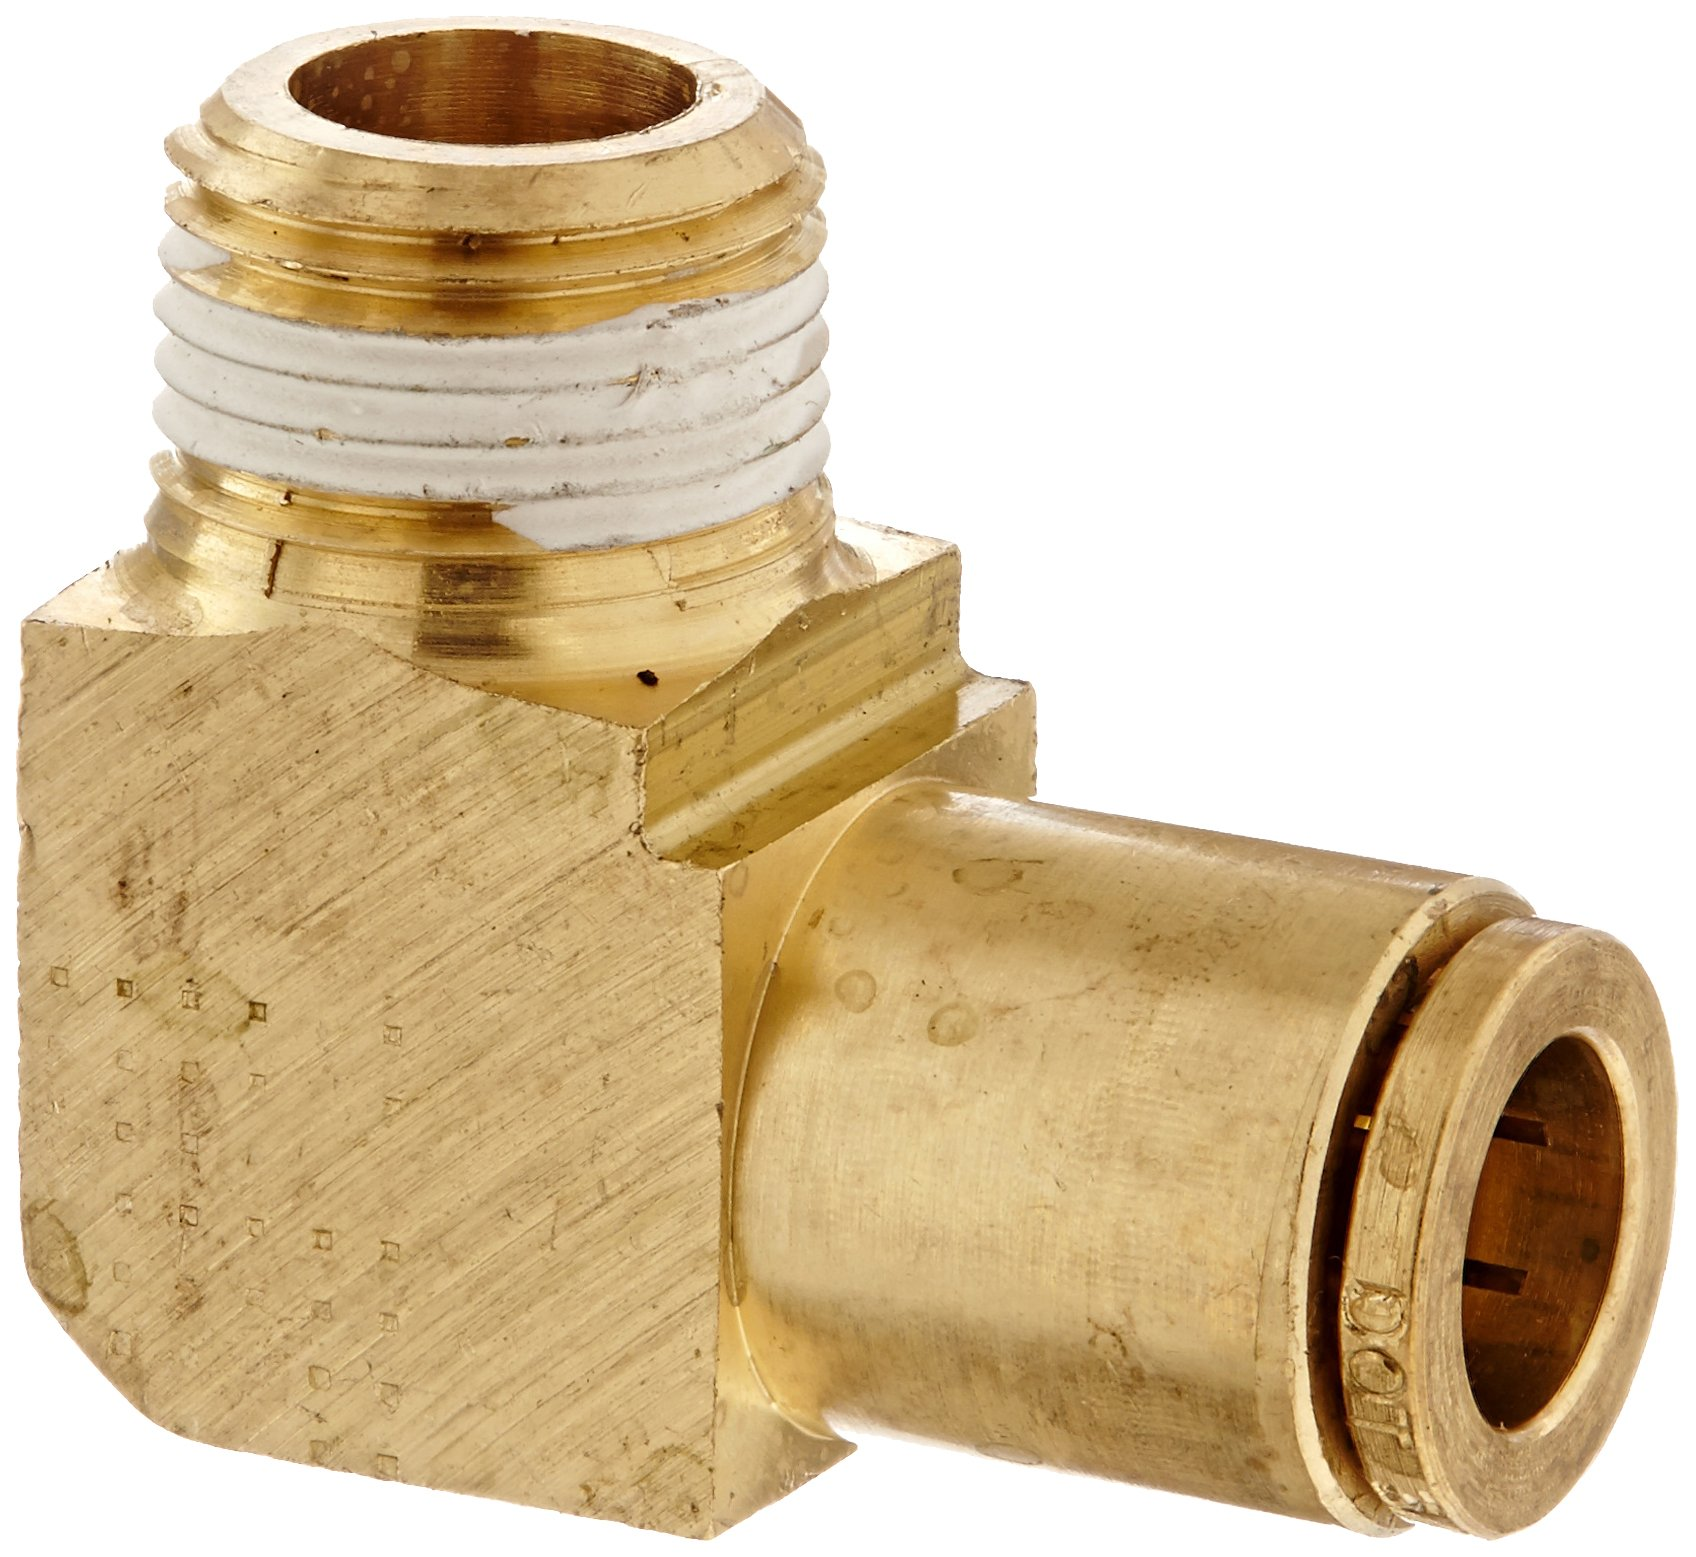 Eaton Weatherhead 1869X6X6 Brass CA360 D.O.T. Air Brake Tube Fitting, 90 Degree Elbow, 3/8'' NPT Male x Tube OD